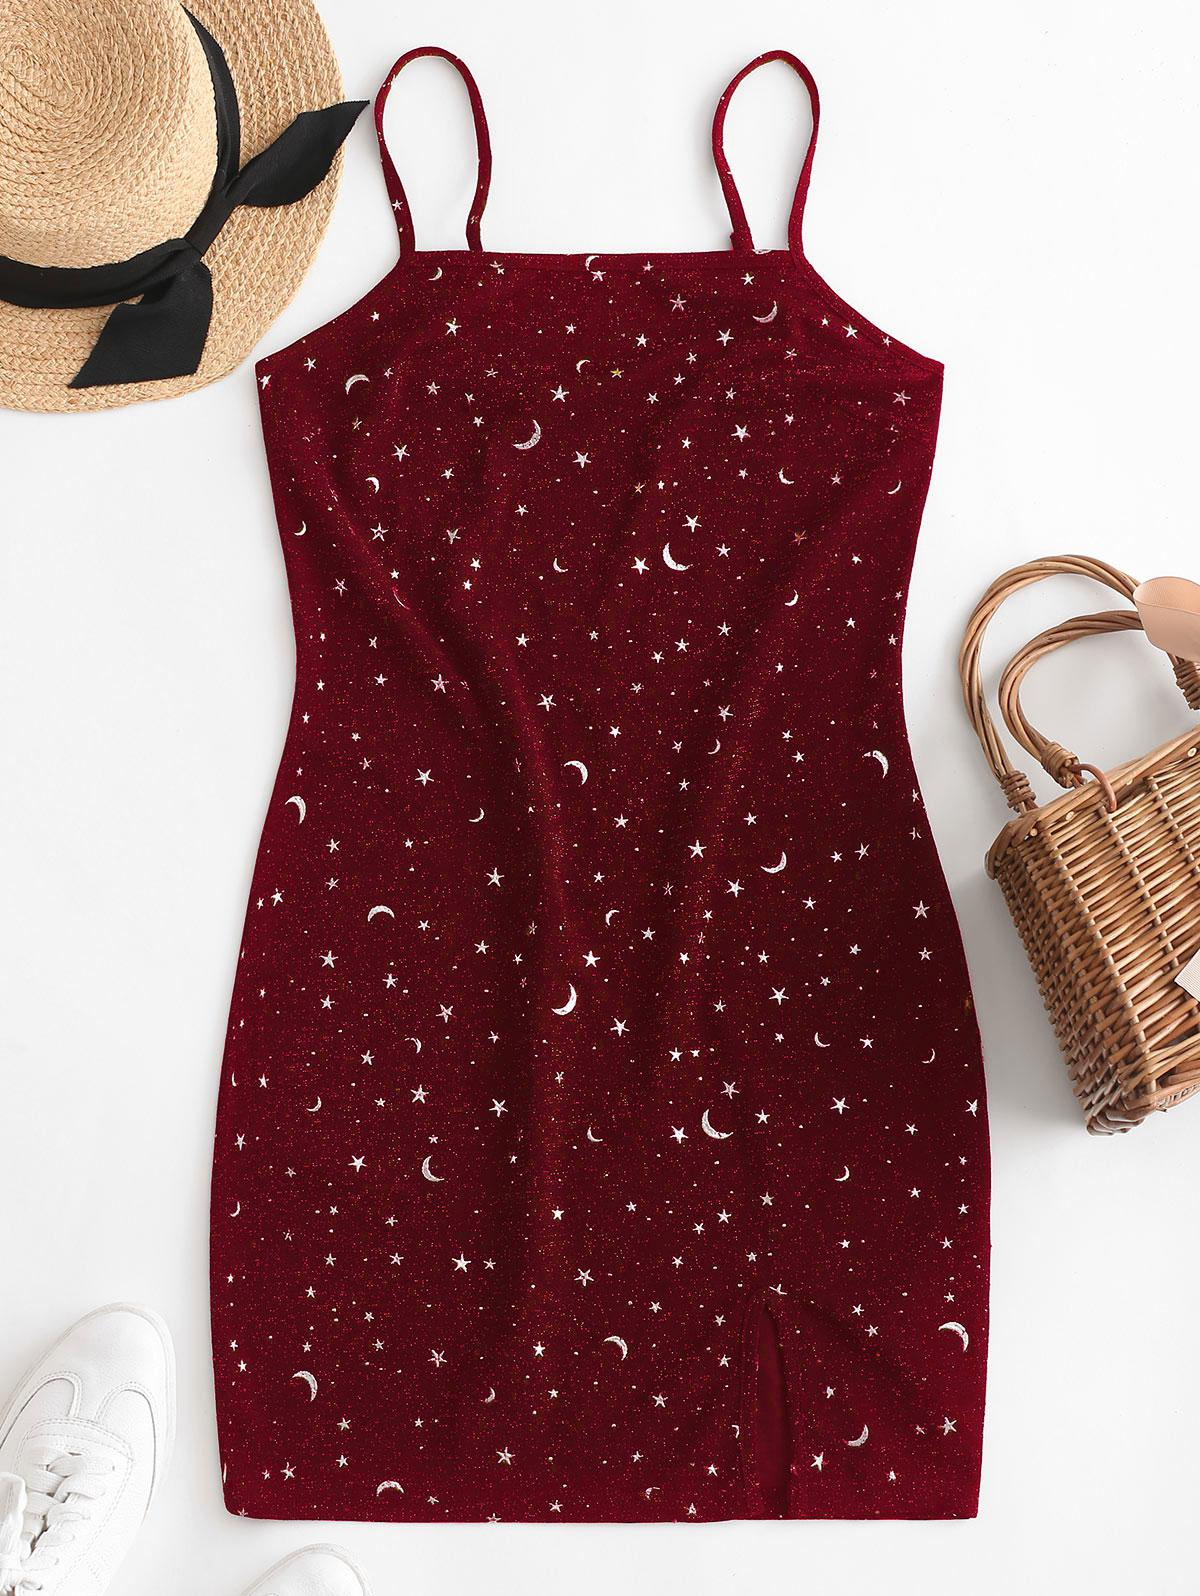 ZAFUL Moon and Star Metallic Thread Cami Slit Dress, Red wine